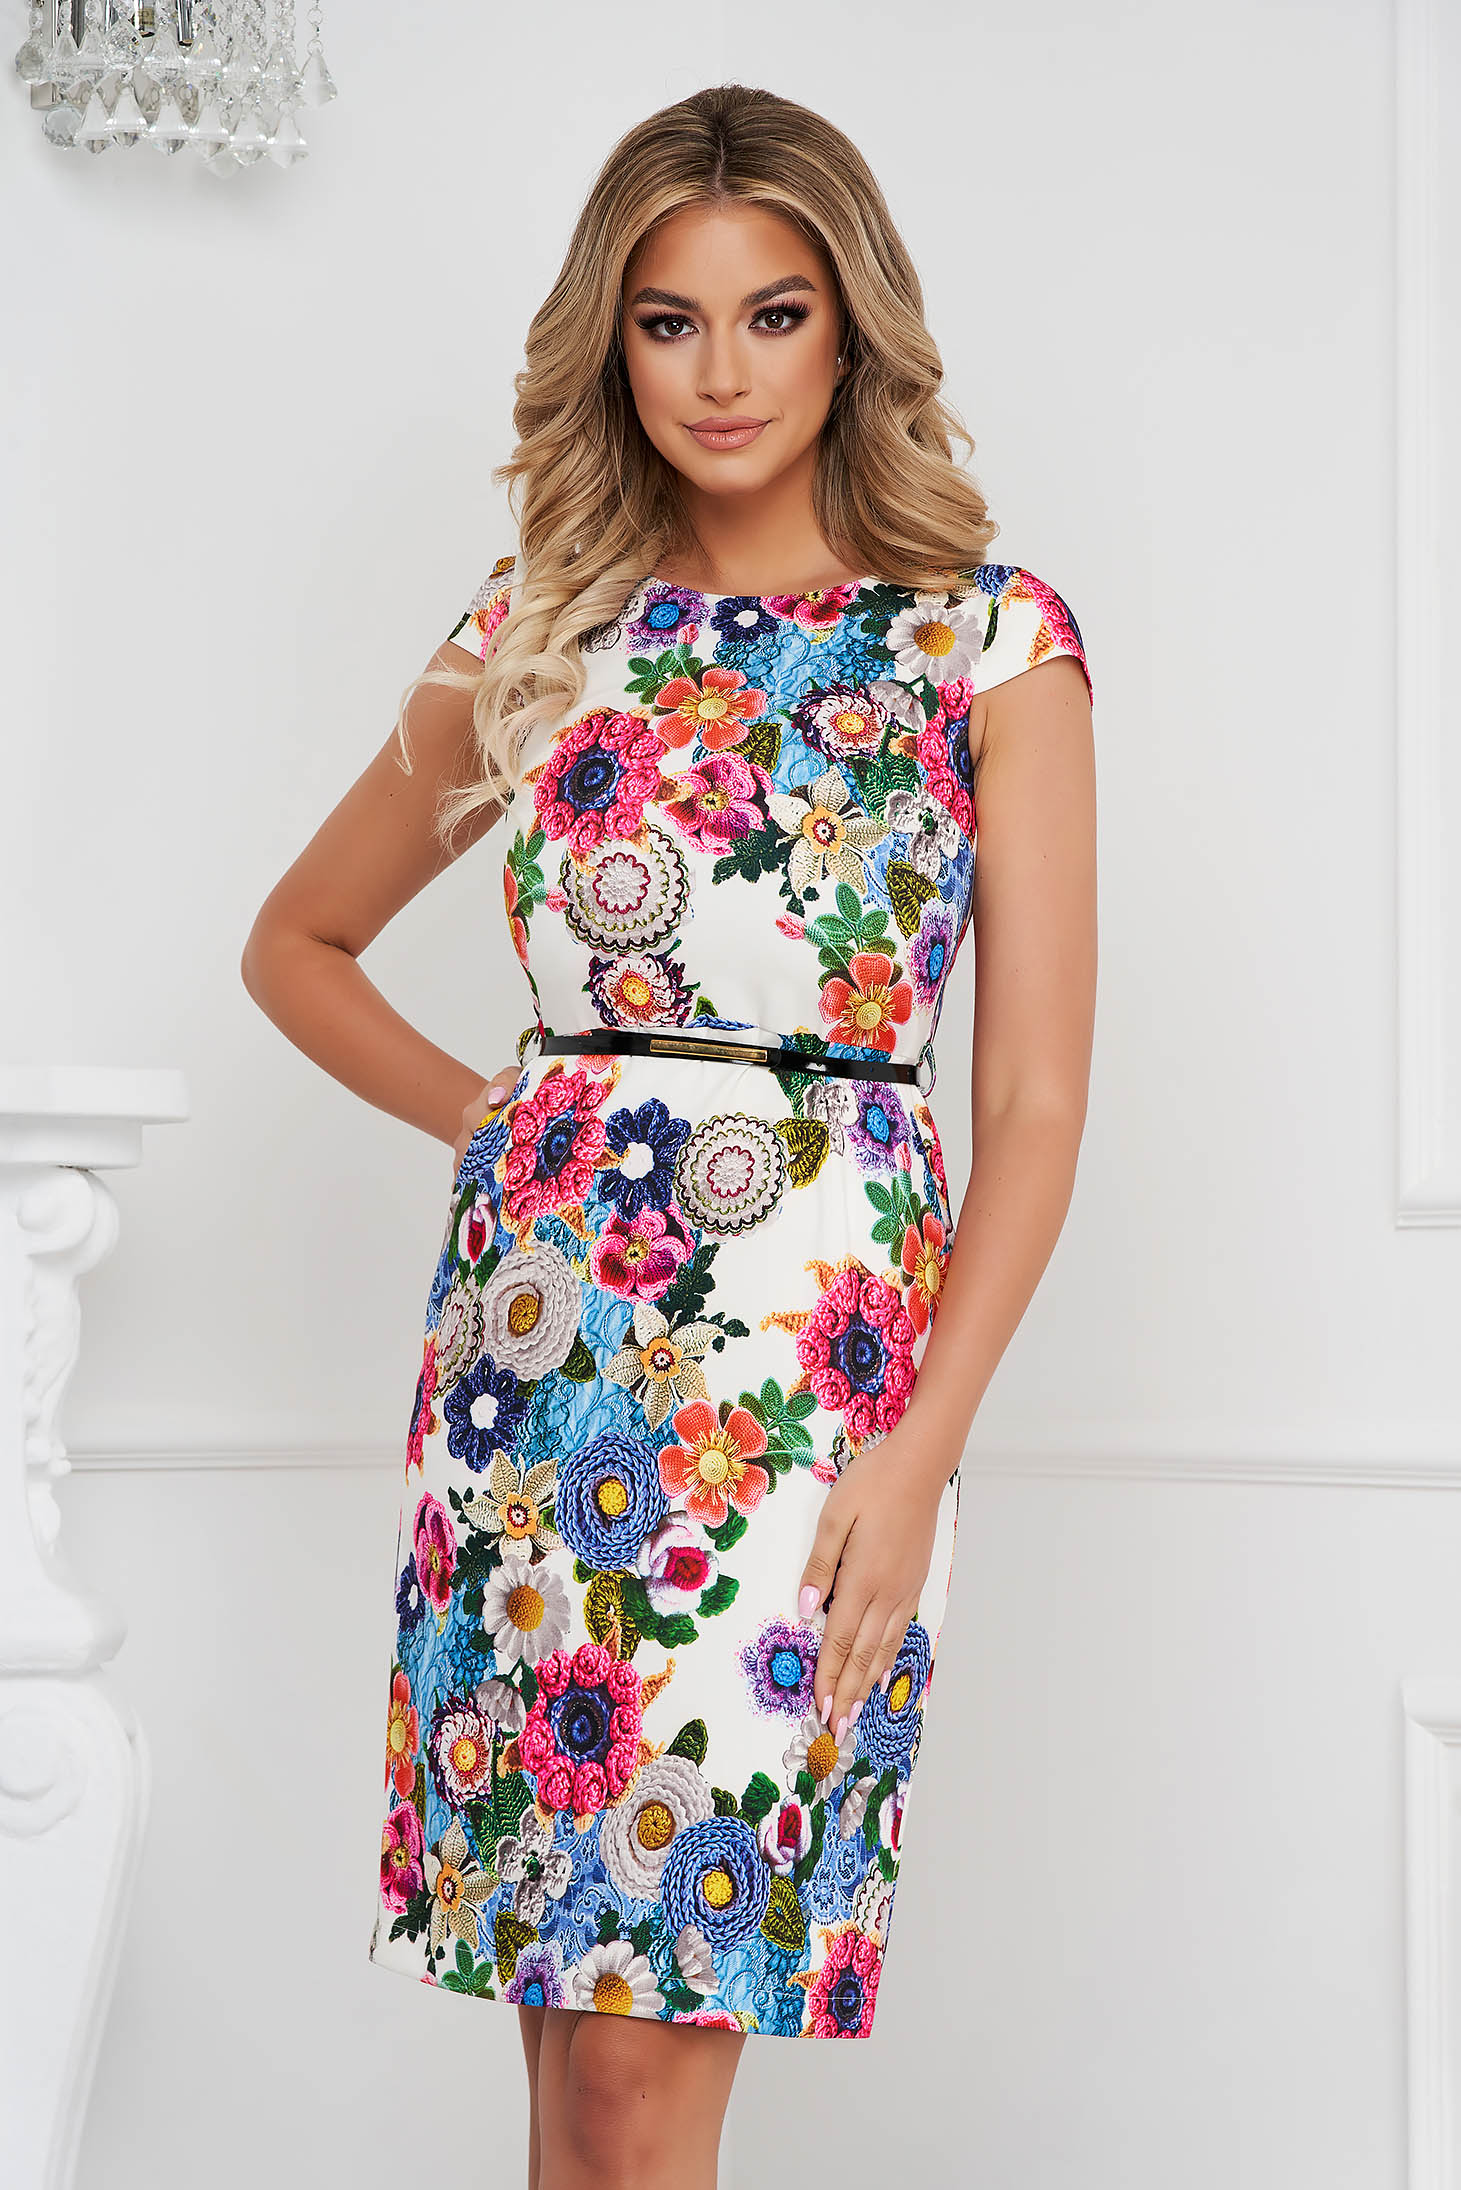 Dress pencil short cut elegant with pockets cloth thin fabric